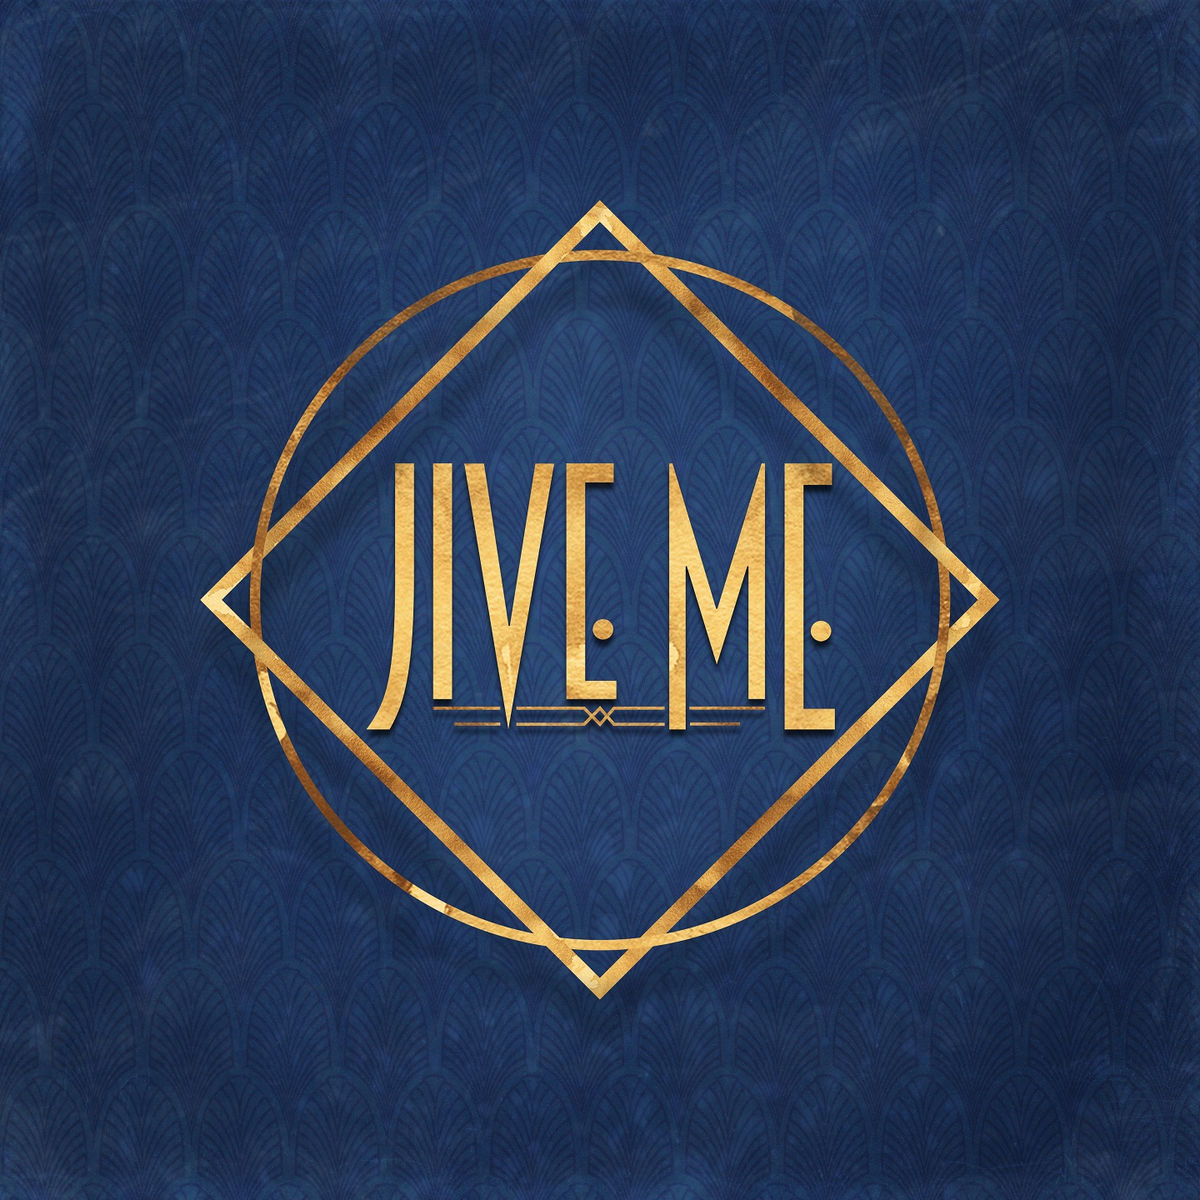 Jive Me - Jive Me